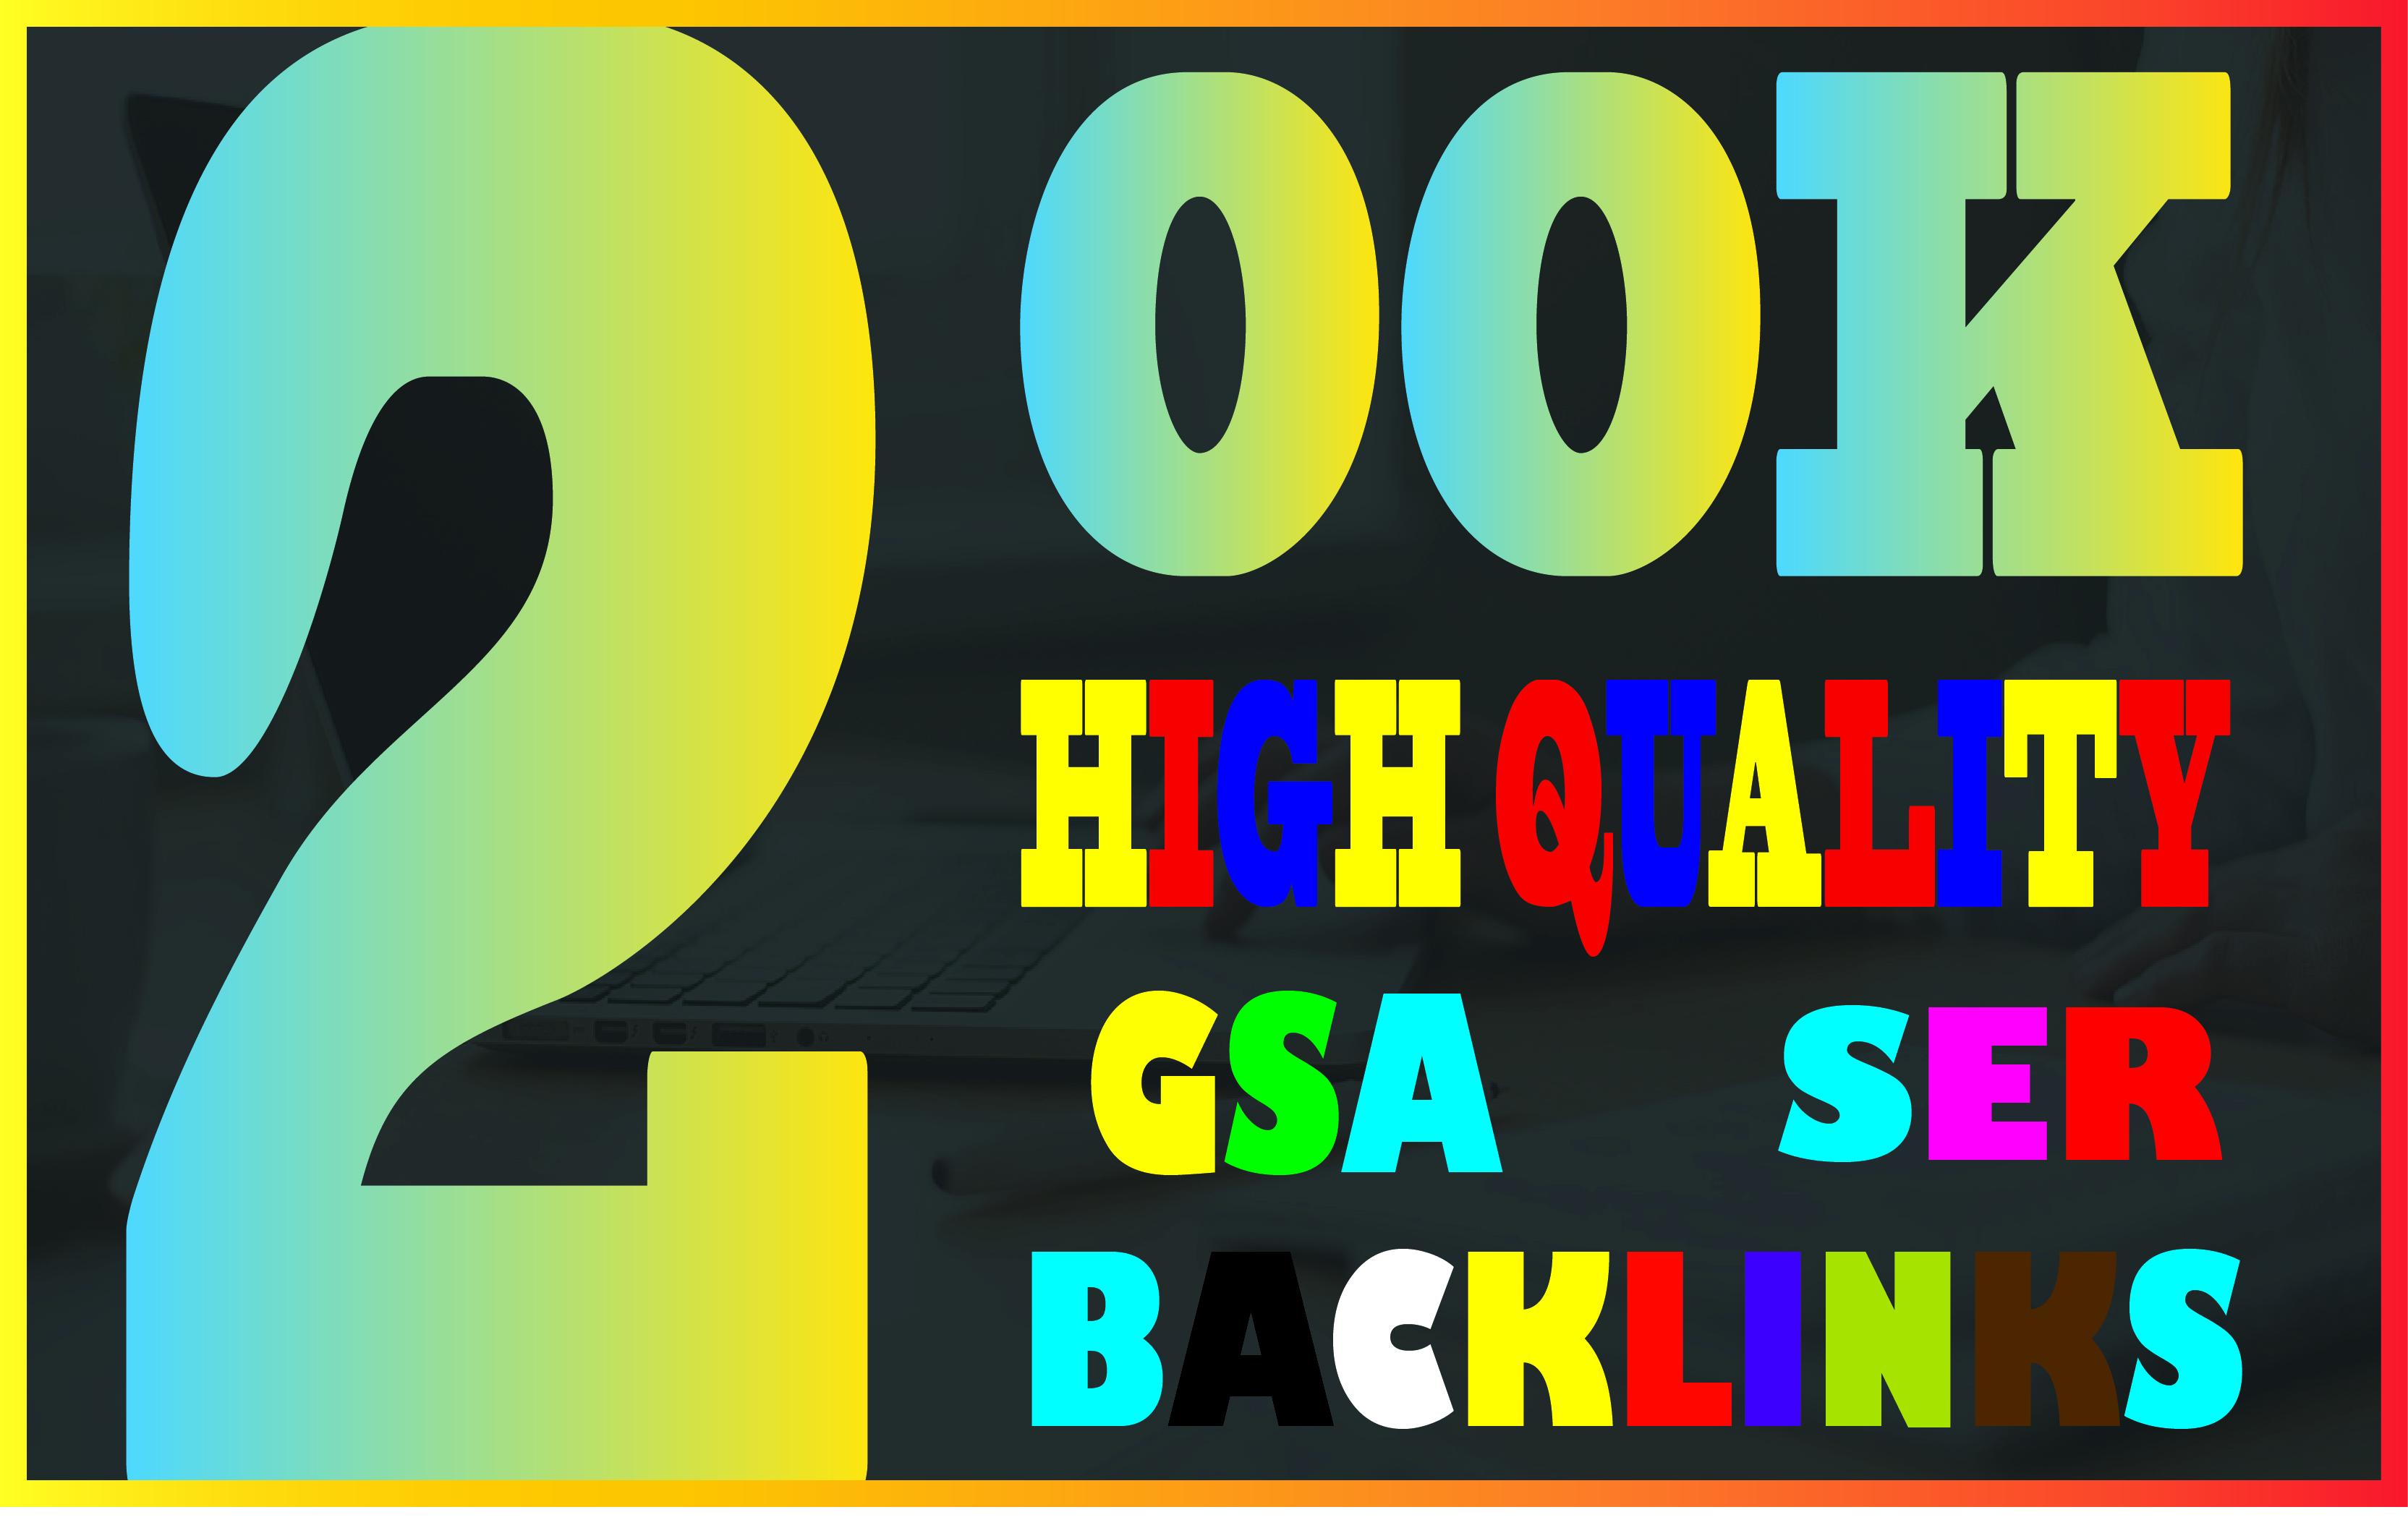 I will create 200k over gsa backlinks,  high quality SEO links